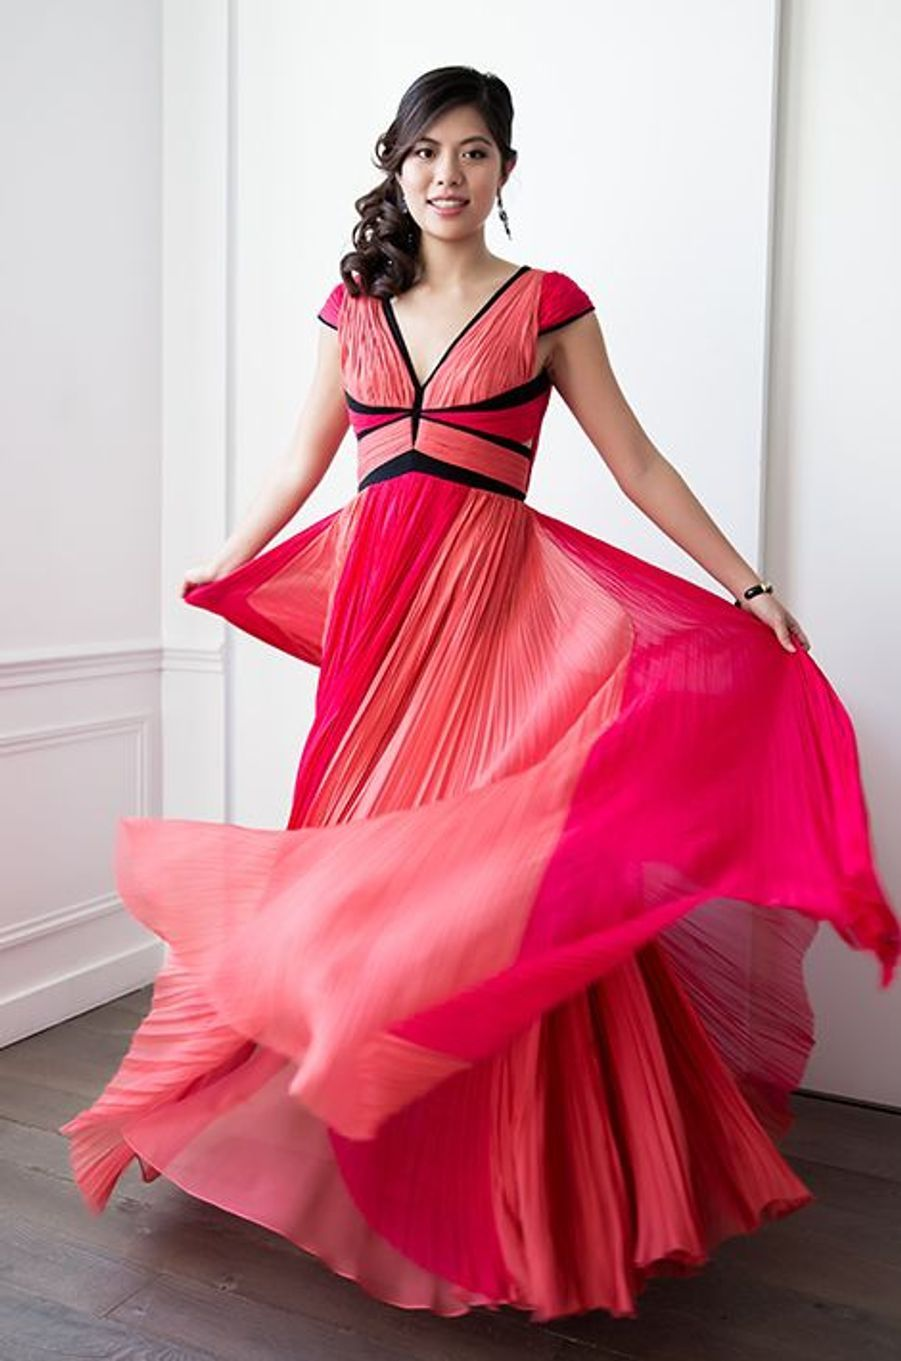 Vanessa Wang (Chine) en robe J. Mendel, bijoux Payal New York